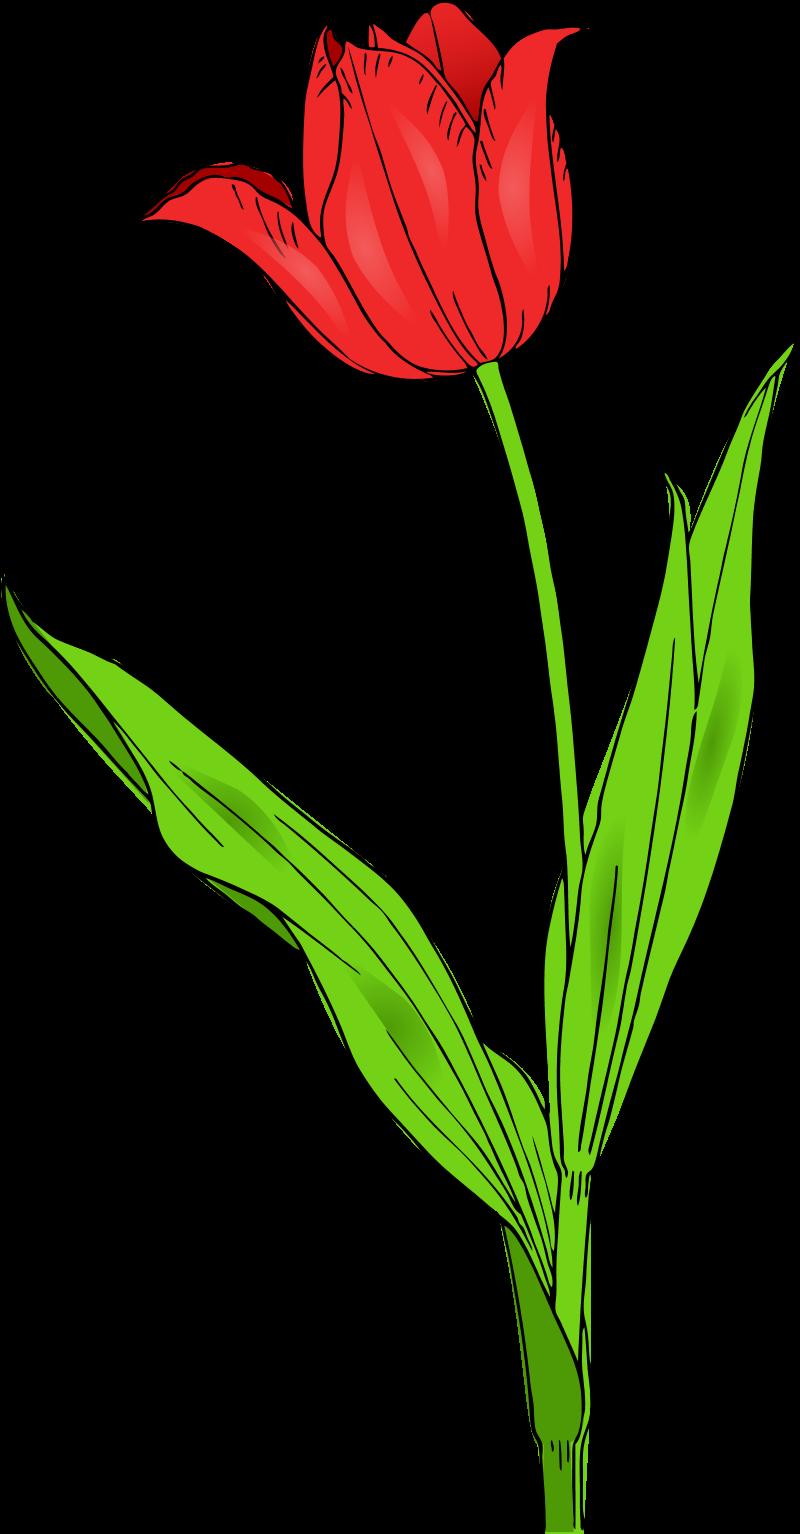 800x1534 Flower Clip Art Image Black